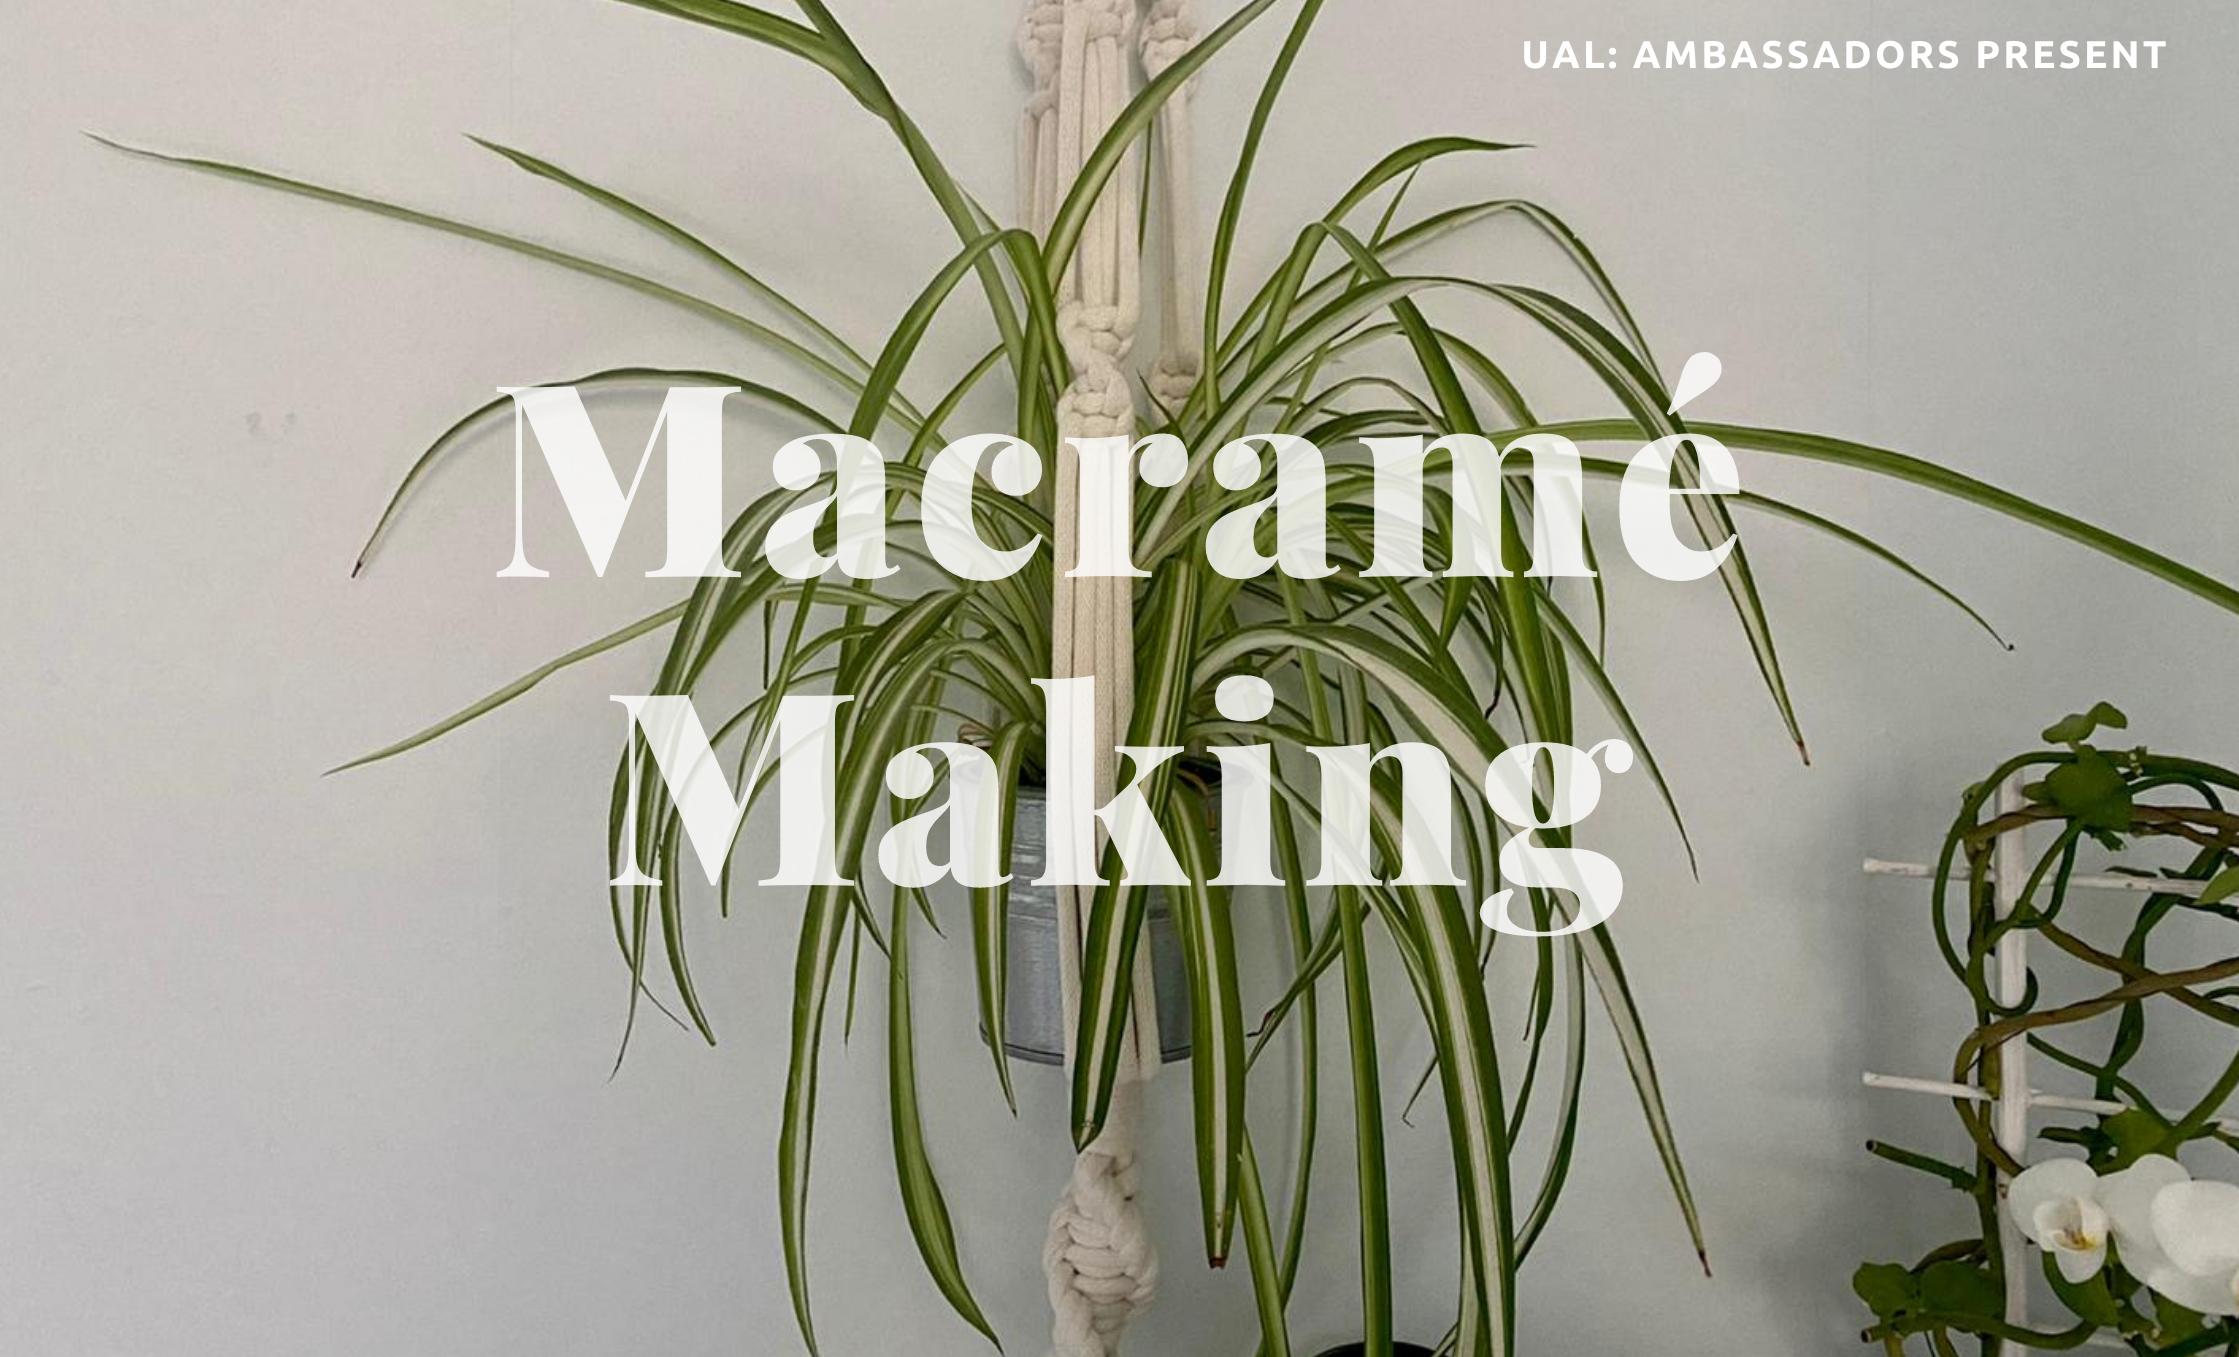 macrame Workshop Text and plant hanger